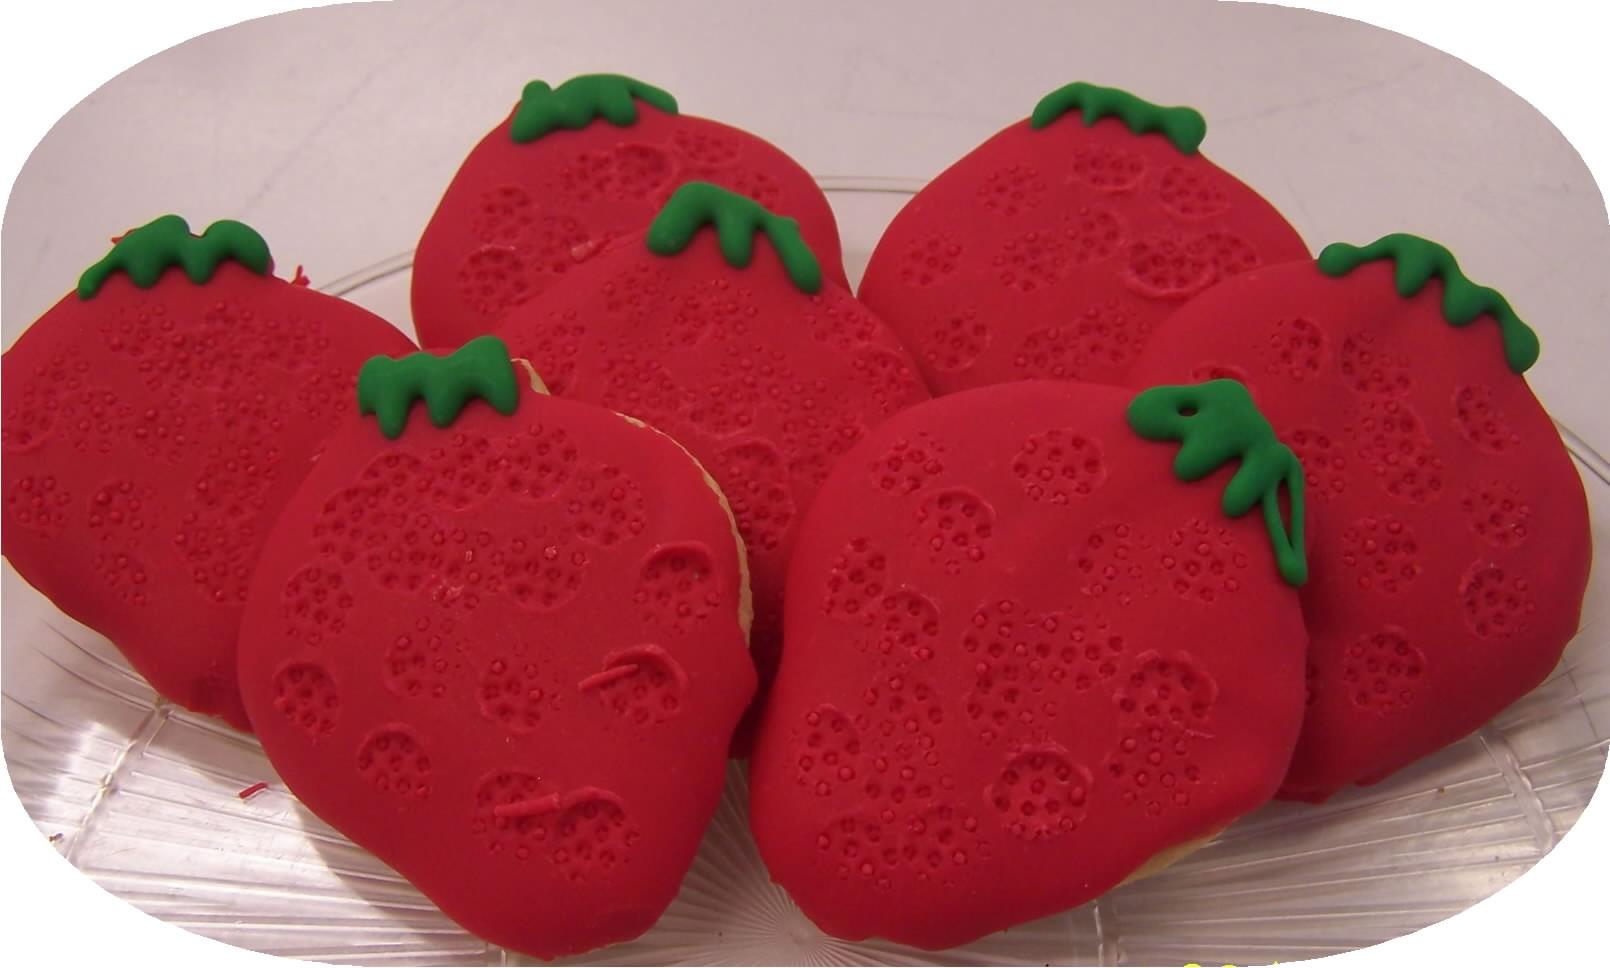 Strawberry-cuts